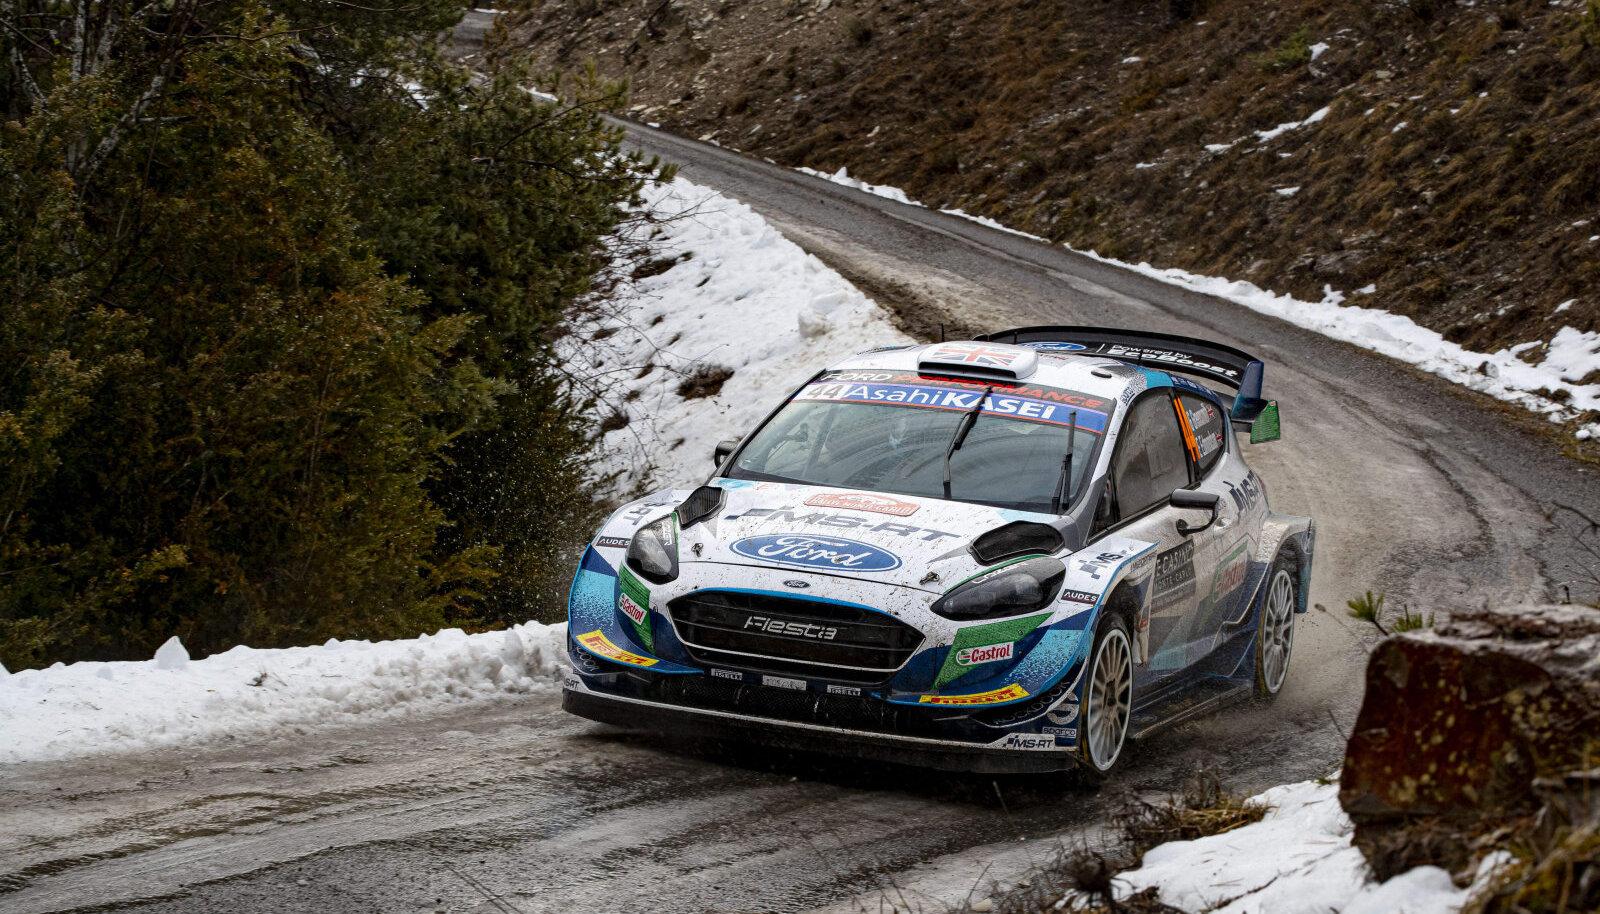 WRC. Pilt on illustratiivne.